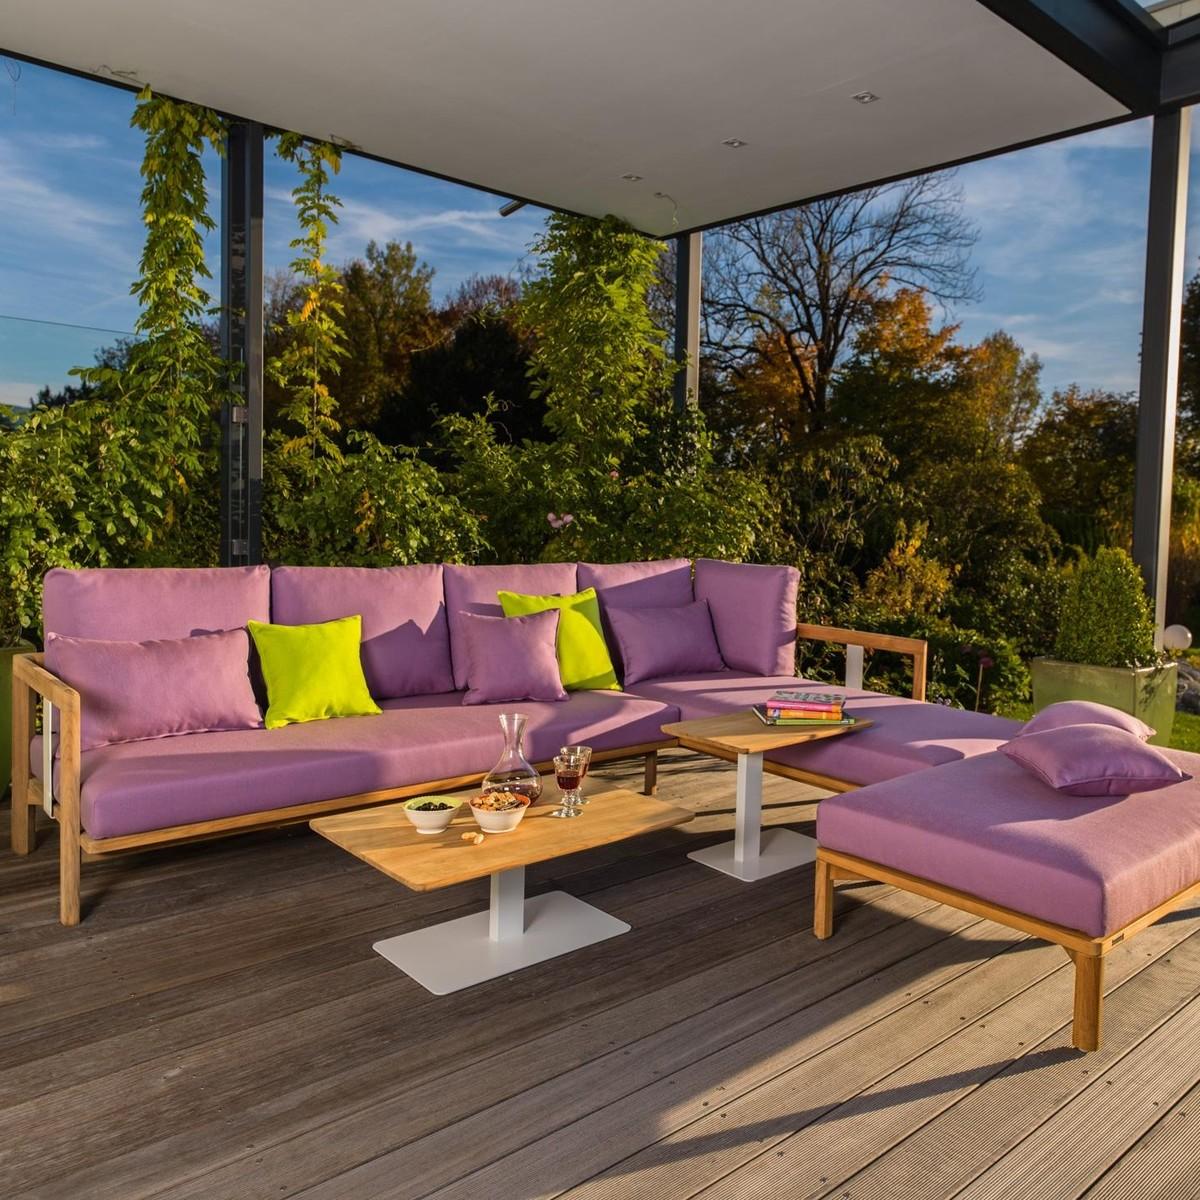 weish upl outdoor kissen 50x50cm weish upl. Black Bedroom Furniture Sets. Home Design Ideas